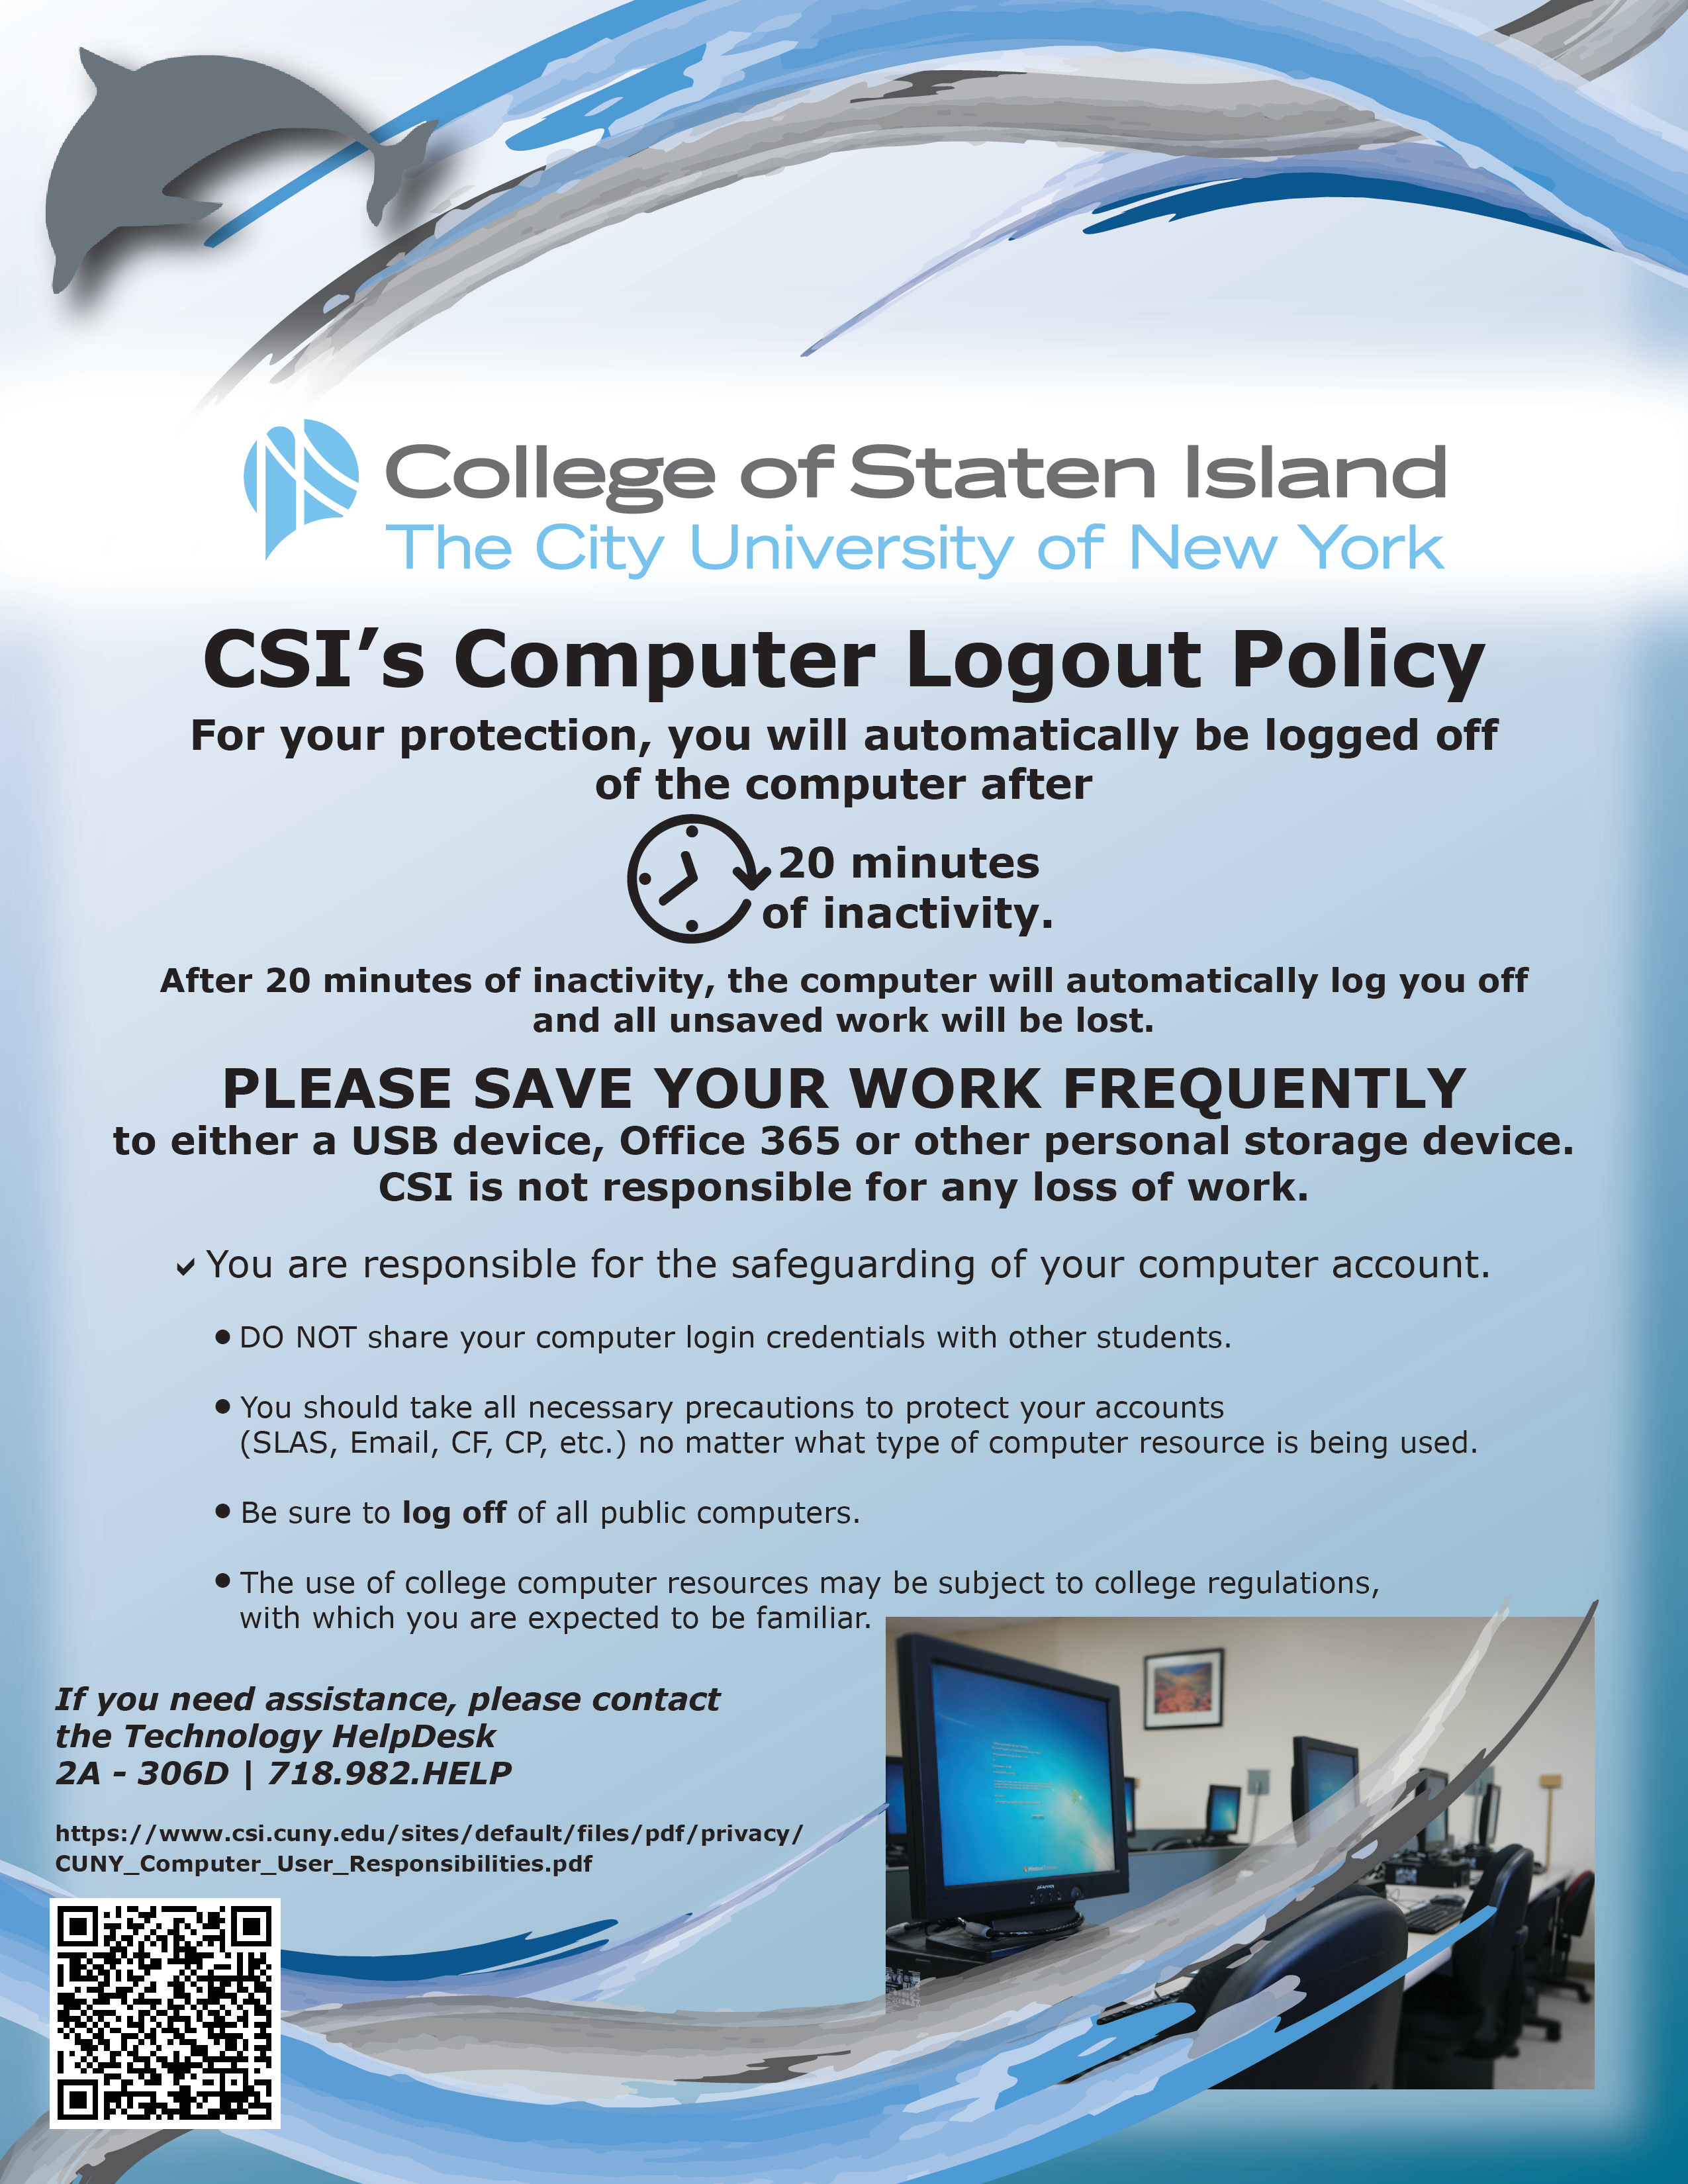 CSI Logout Policy